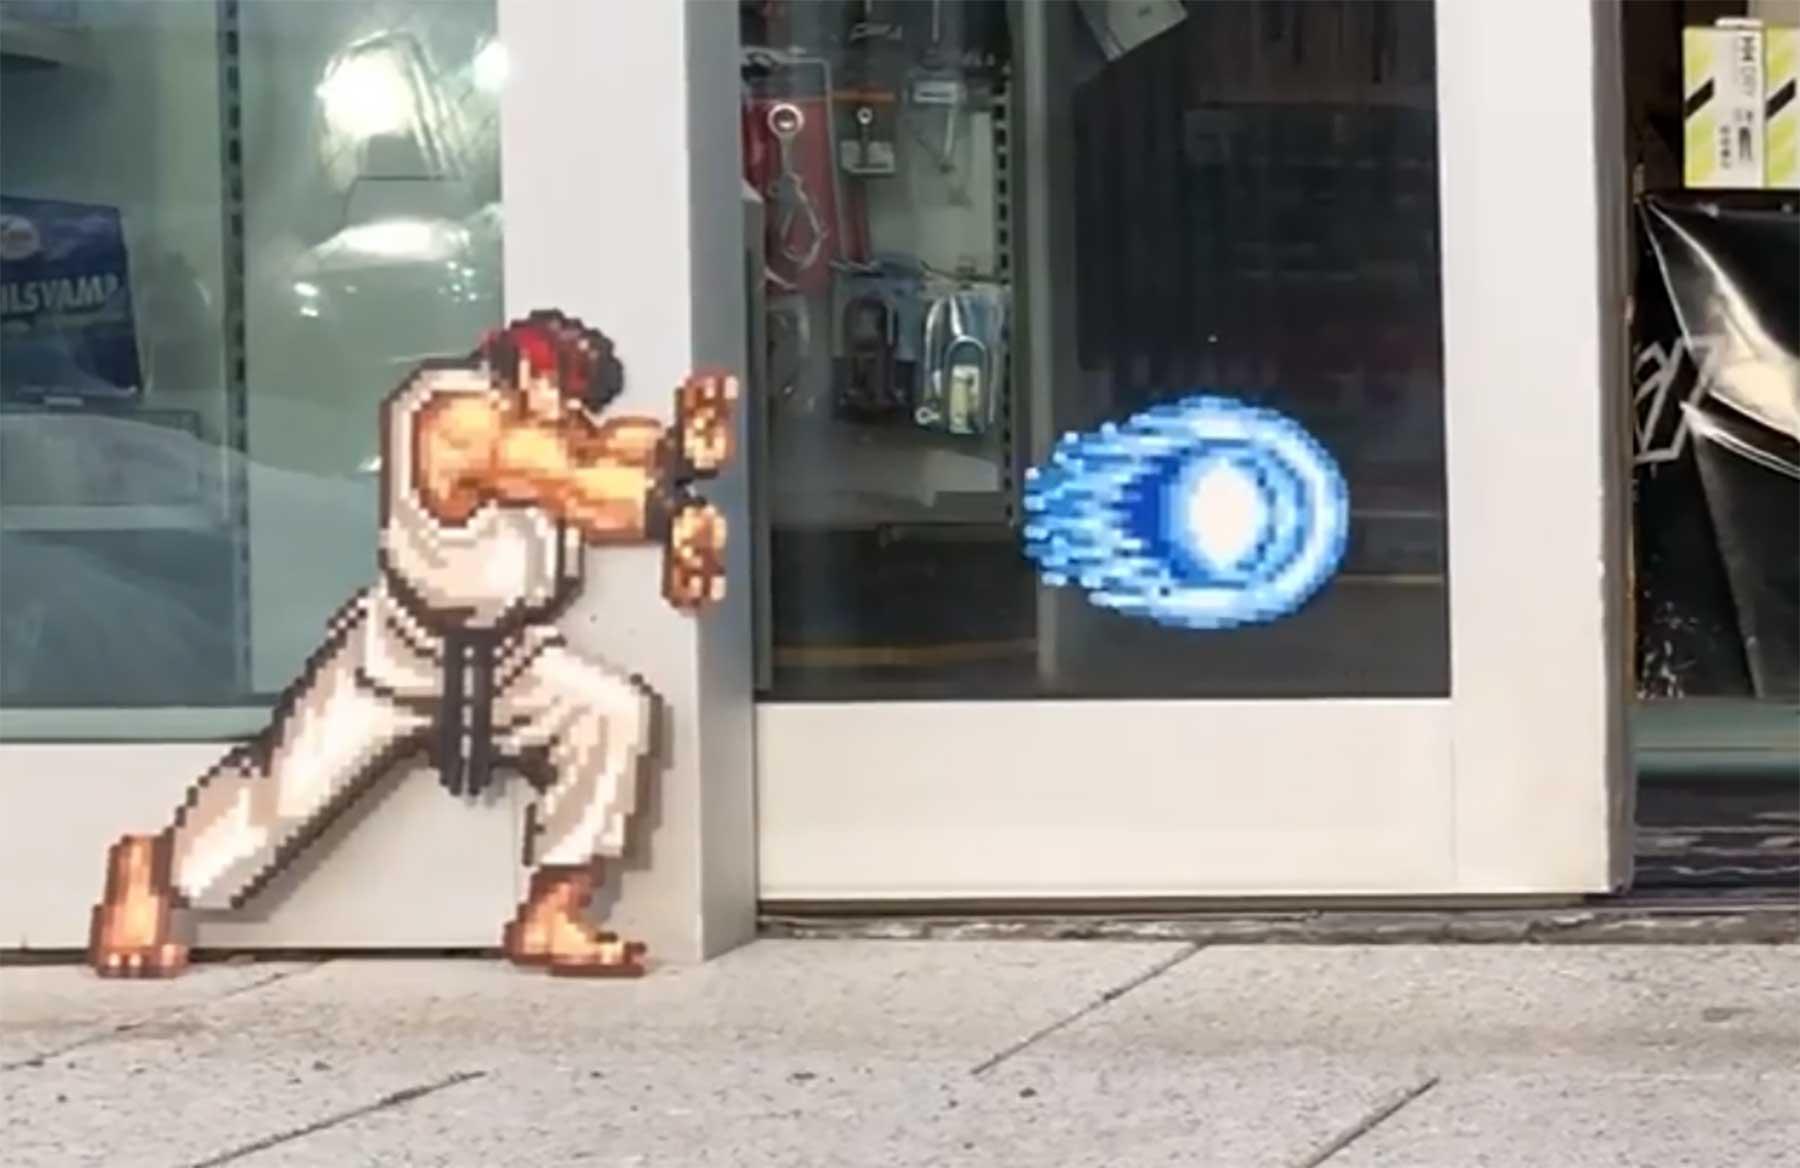 Bügelperlen-Animation dank automatischer Türen pappas-paerlor-street-art